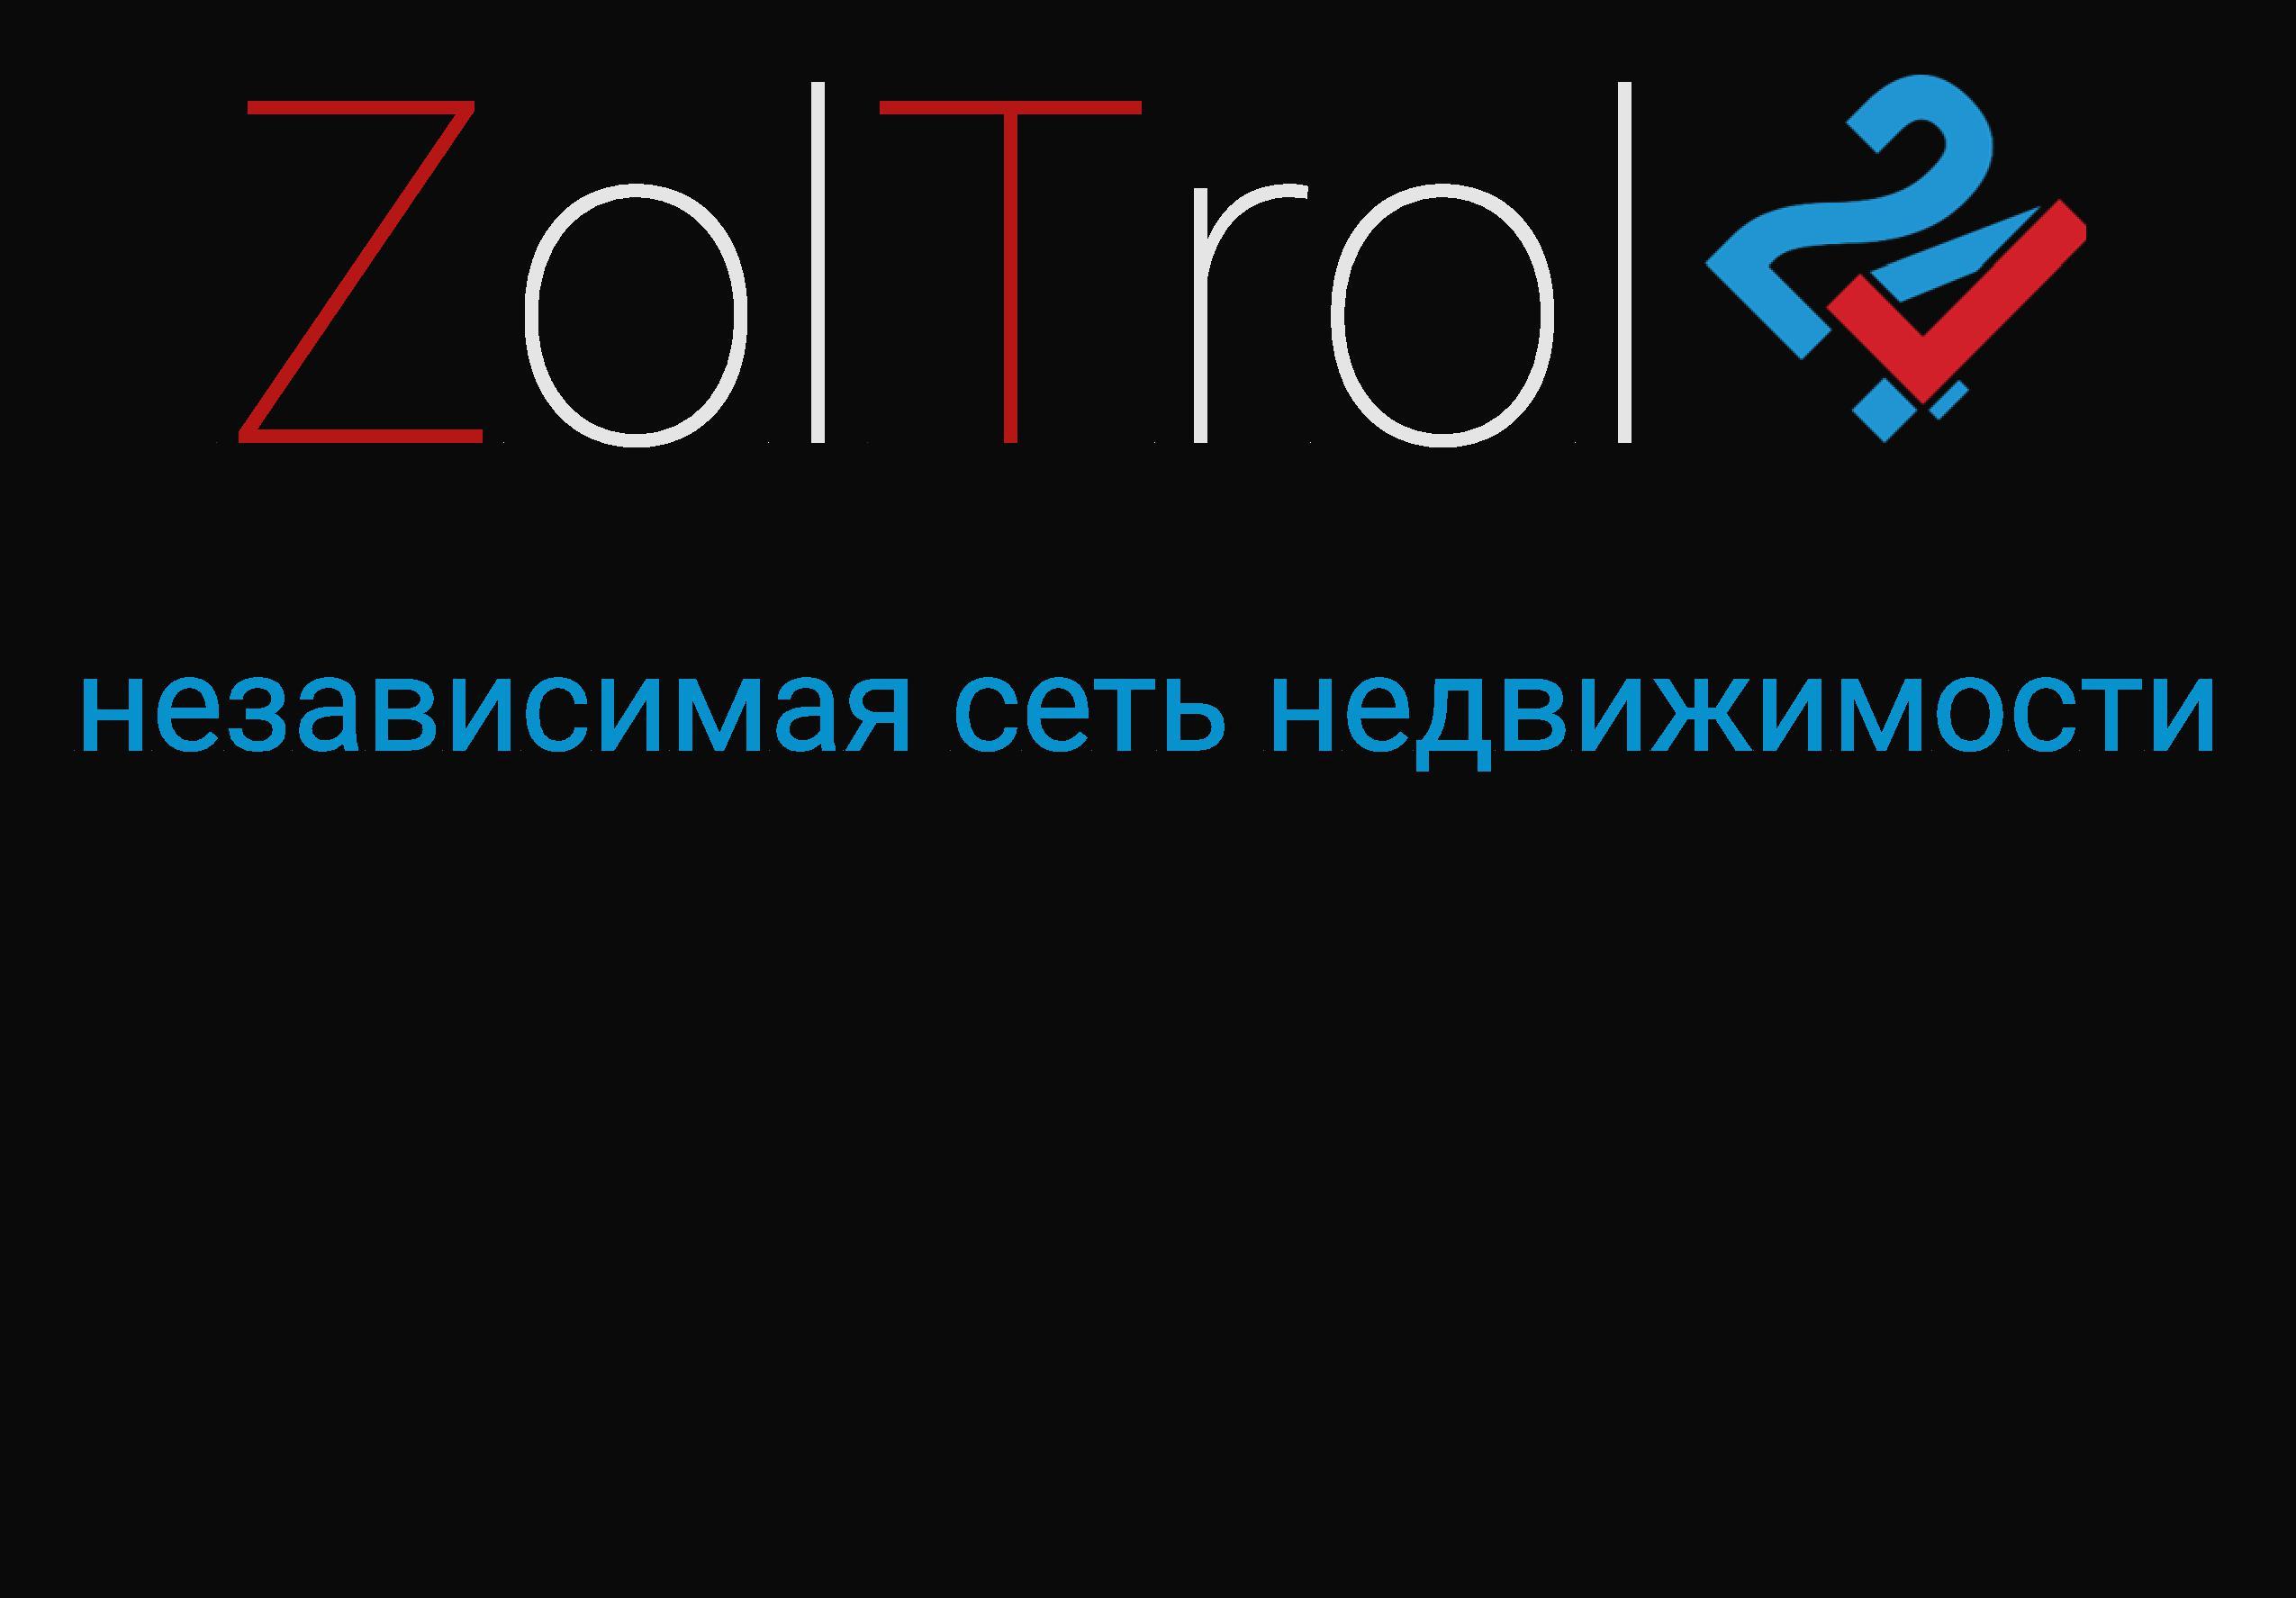 Логотип и фирменный стиль ZolTor24 фото f_4335c87aee372458.jpg